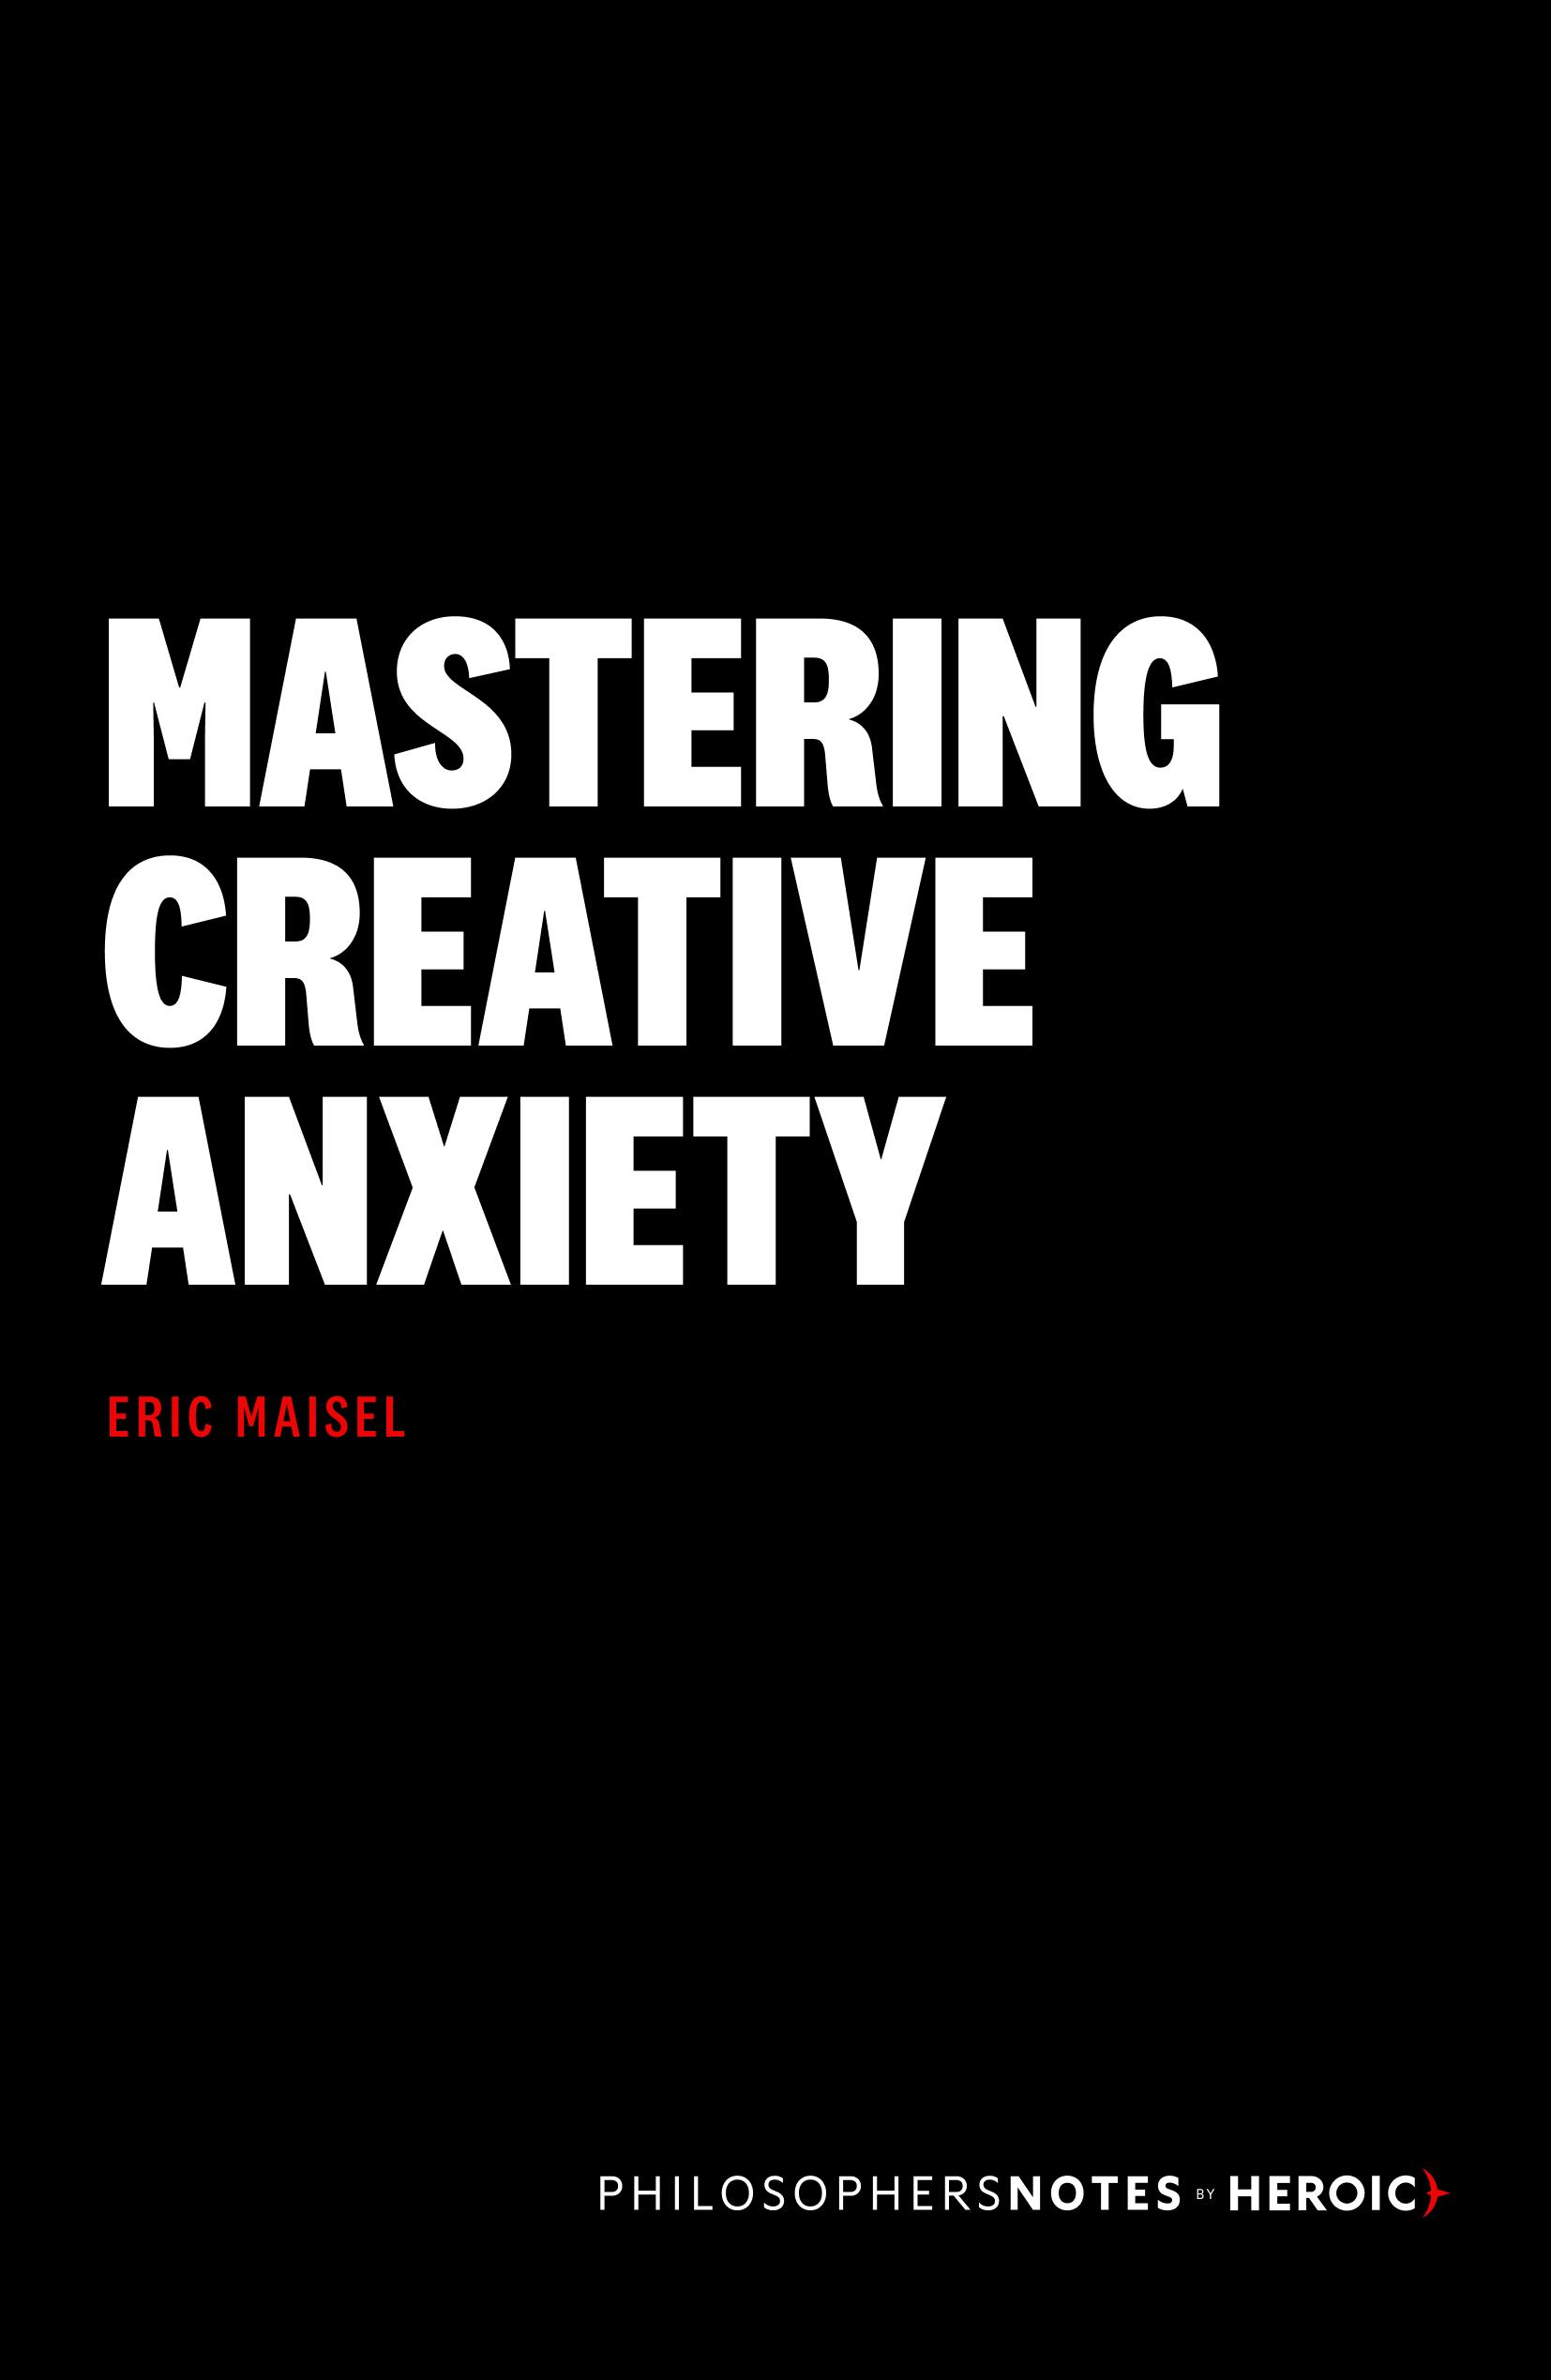 Mastering Creative Anxiety